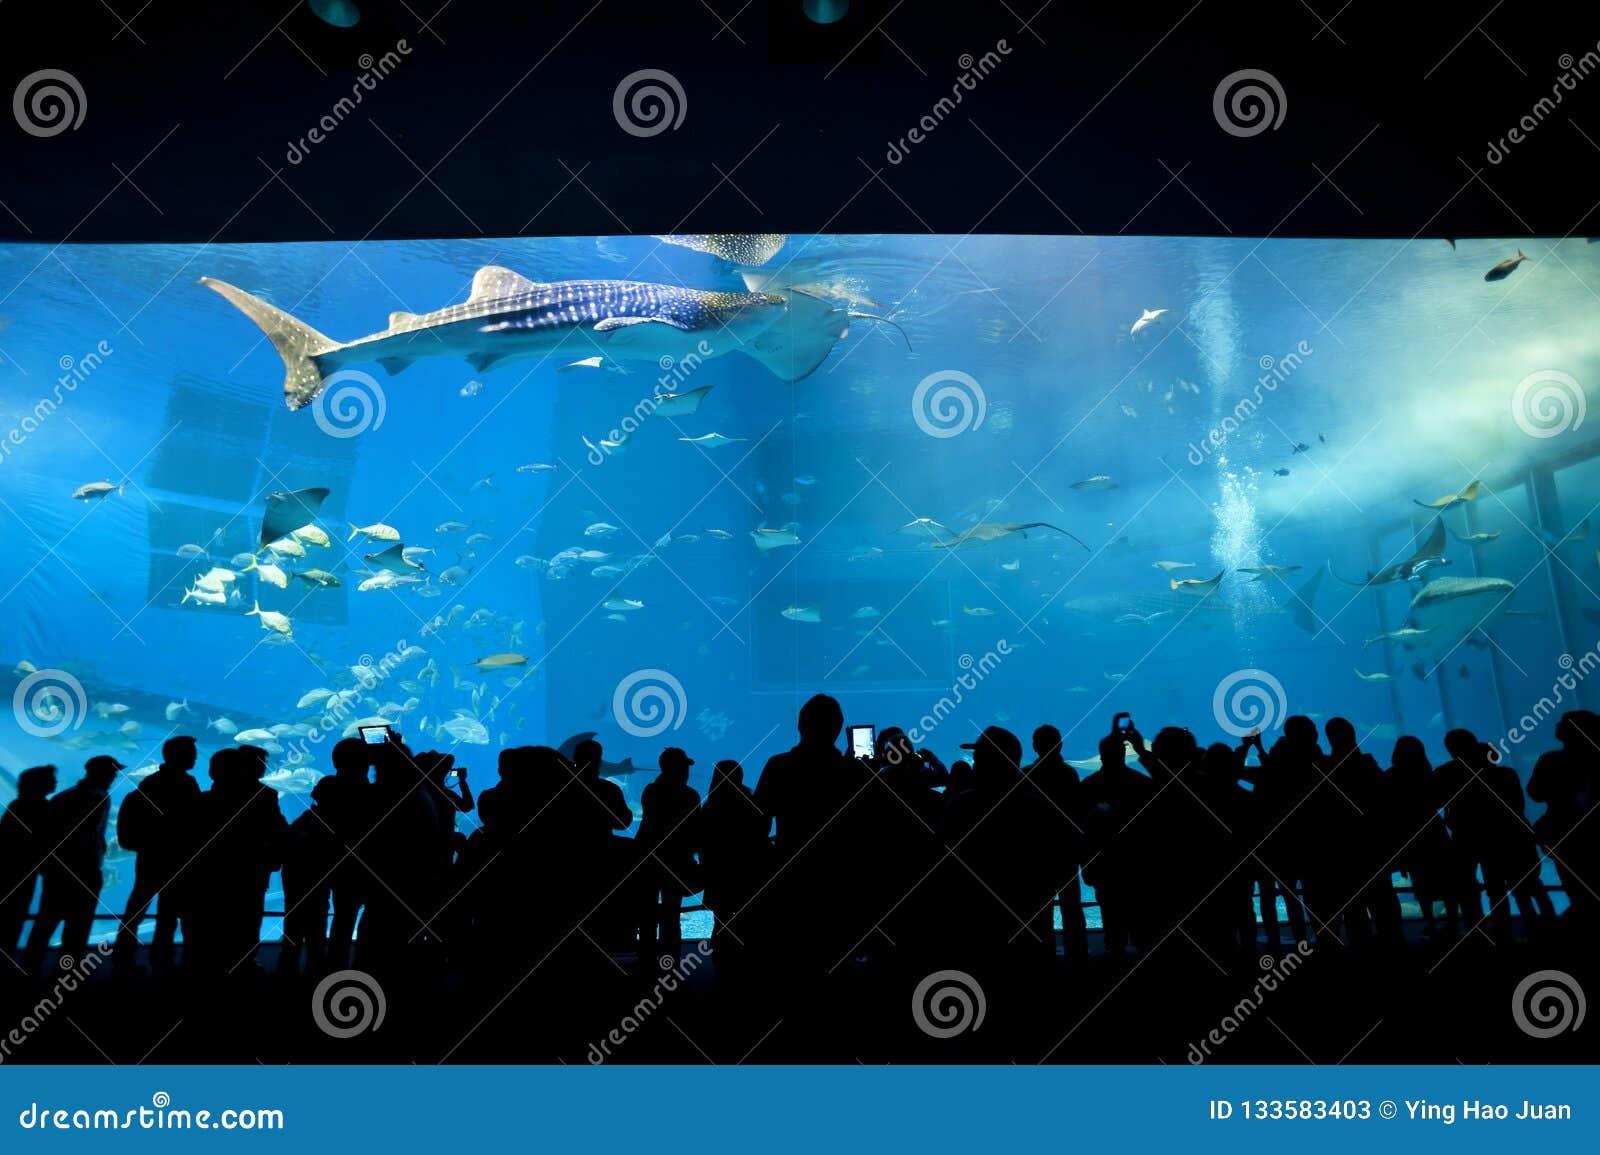 Okinawa Aquarium main tank